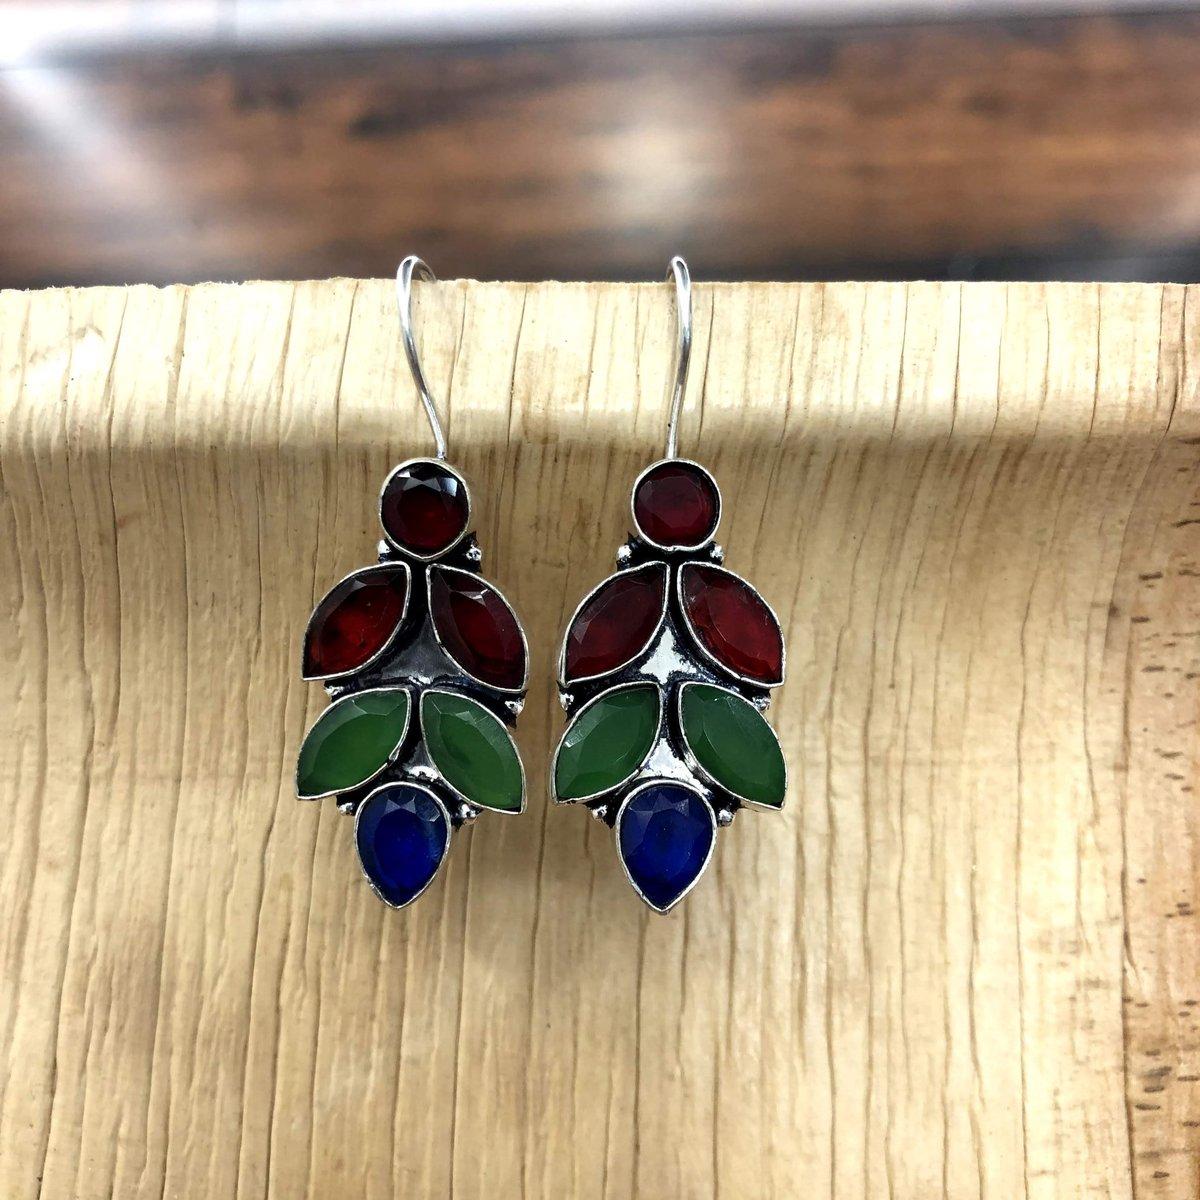 Oxidised Stone Drop Earrings  #fashion #accessories #jewellery #jewelry #oxidised #oxidisedjewellery #oxidisedearrings #stone #earrings #dropearrings #traditional #ethnic #indowestern #ethnicwear #shop #shopping #classic #modern #style #wearyourstyle #indianwear #ladieswearpic.twitter.com/adi0CMYtzf